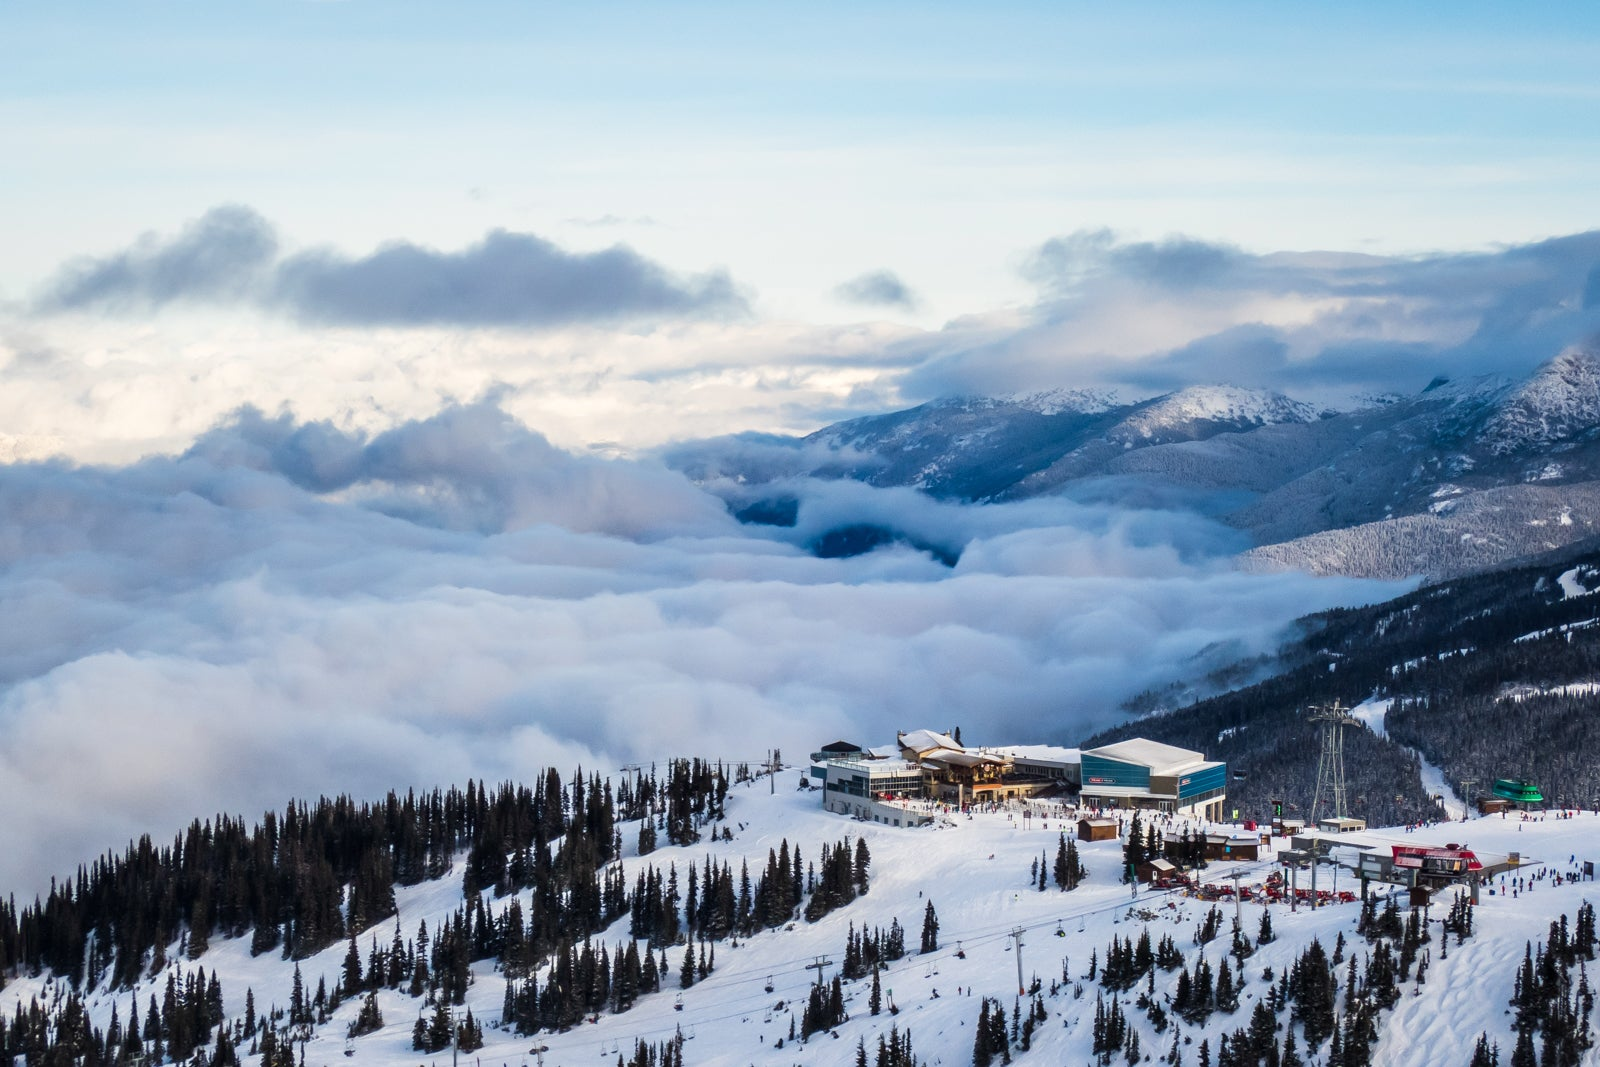 Whistler Blackcomb Ski Resorts Roundhouse and Peak 2 Peak Gondola. (Photo via Getty Images)